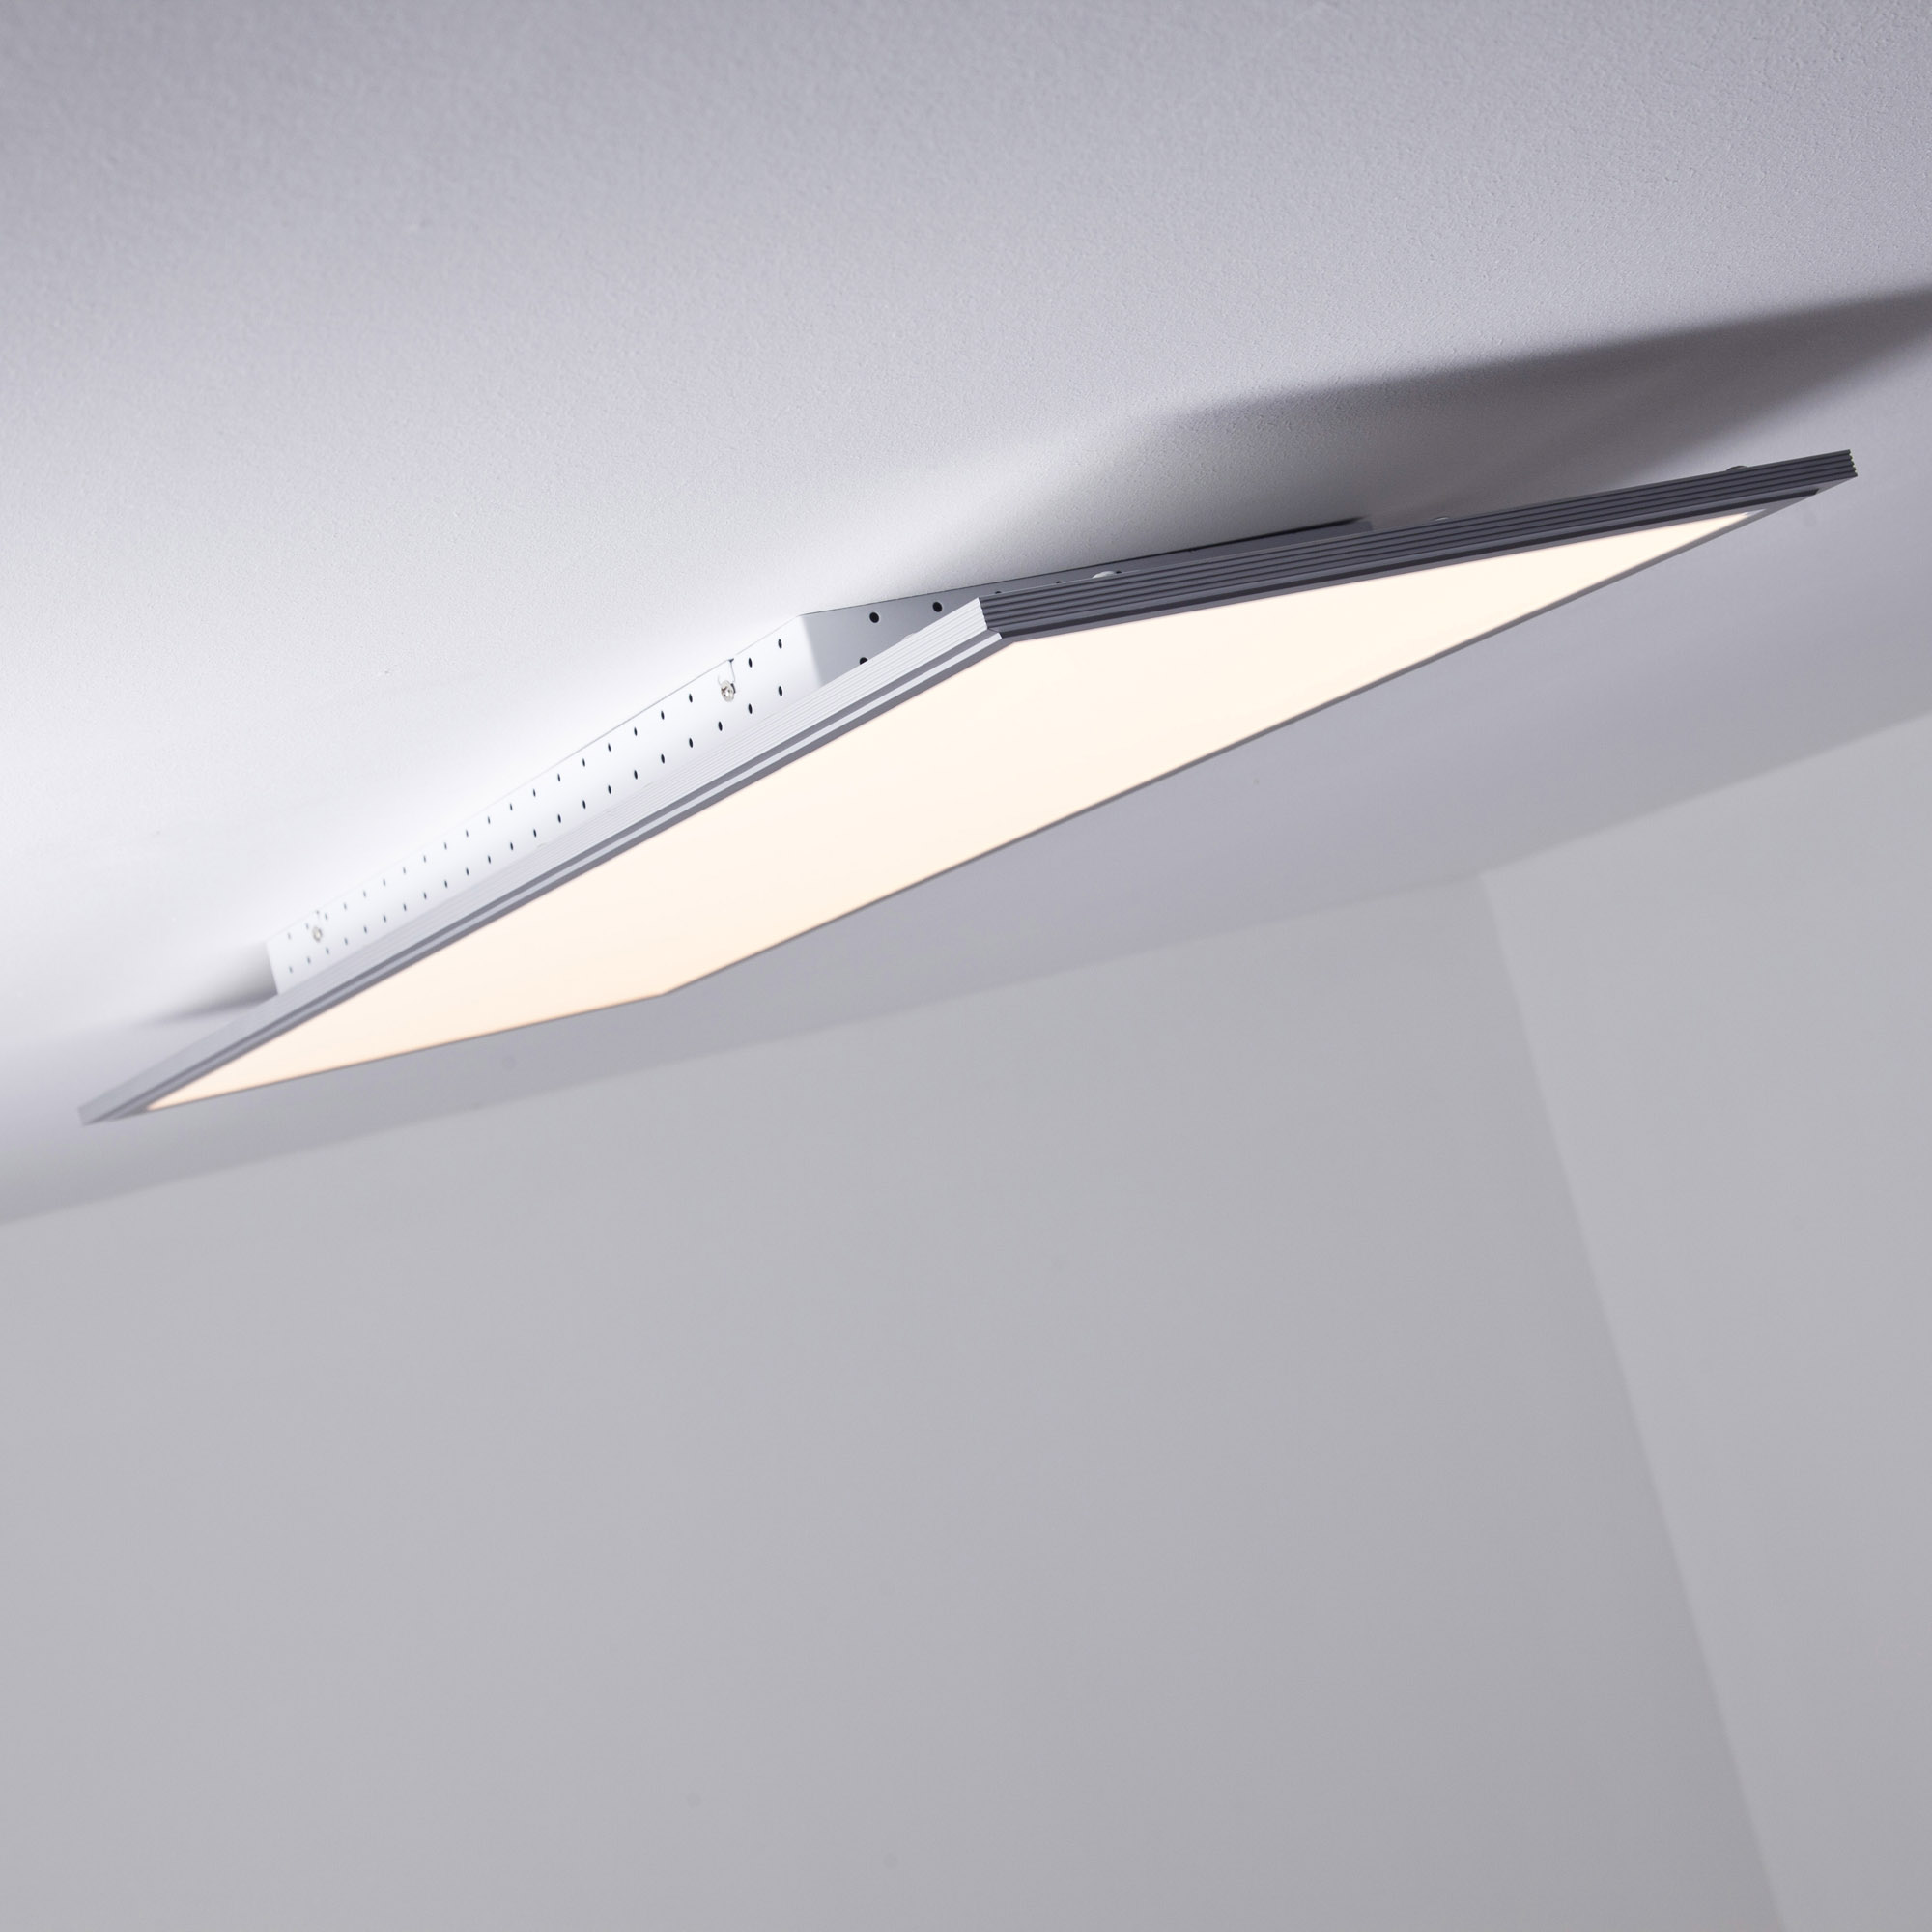 led panel 60w deckenleuchte inkl fernbedienung 100cm x 35cm lumen dimmbar 2700 6500k. Black Bedroom Furniture Sets. Home Design Ideas